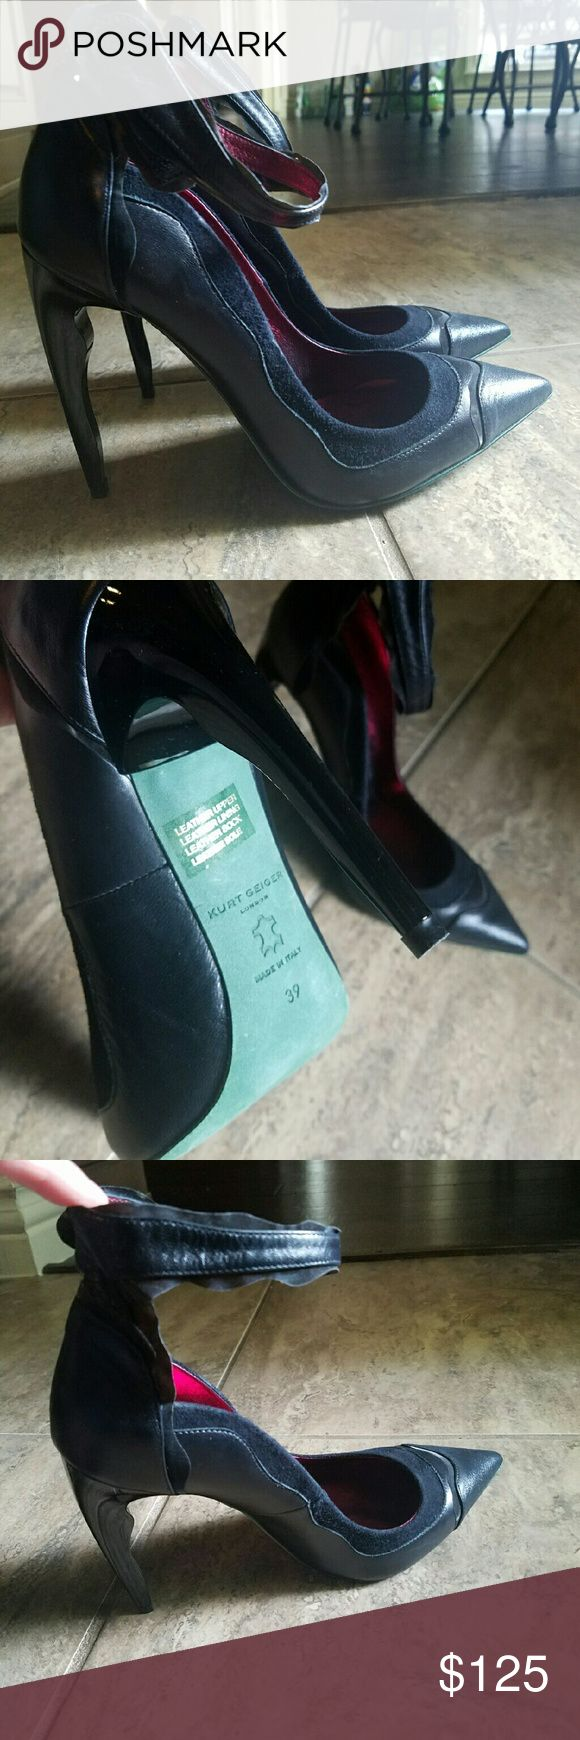 Brand New Kurt Geiger London Stilettos NWOT WEEKEND SPECIAL!! Brand New Kurt Geiger London...hard to find Stilettos!💕 Kurt Geiger  Shoes Heels